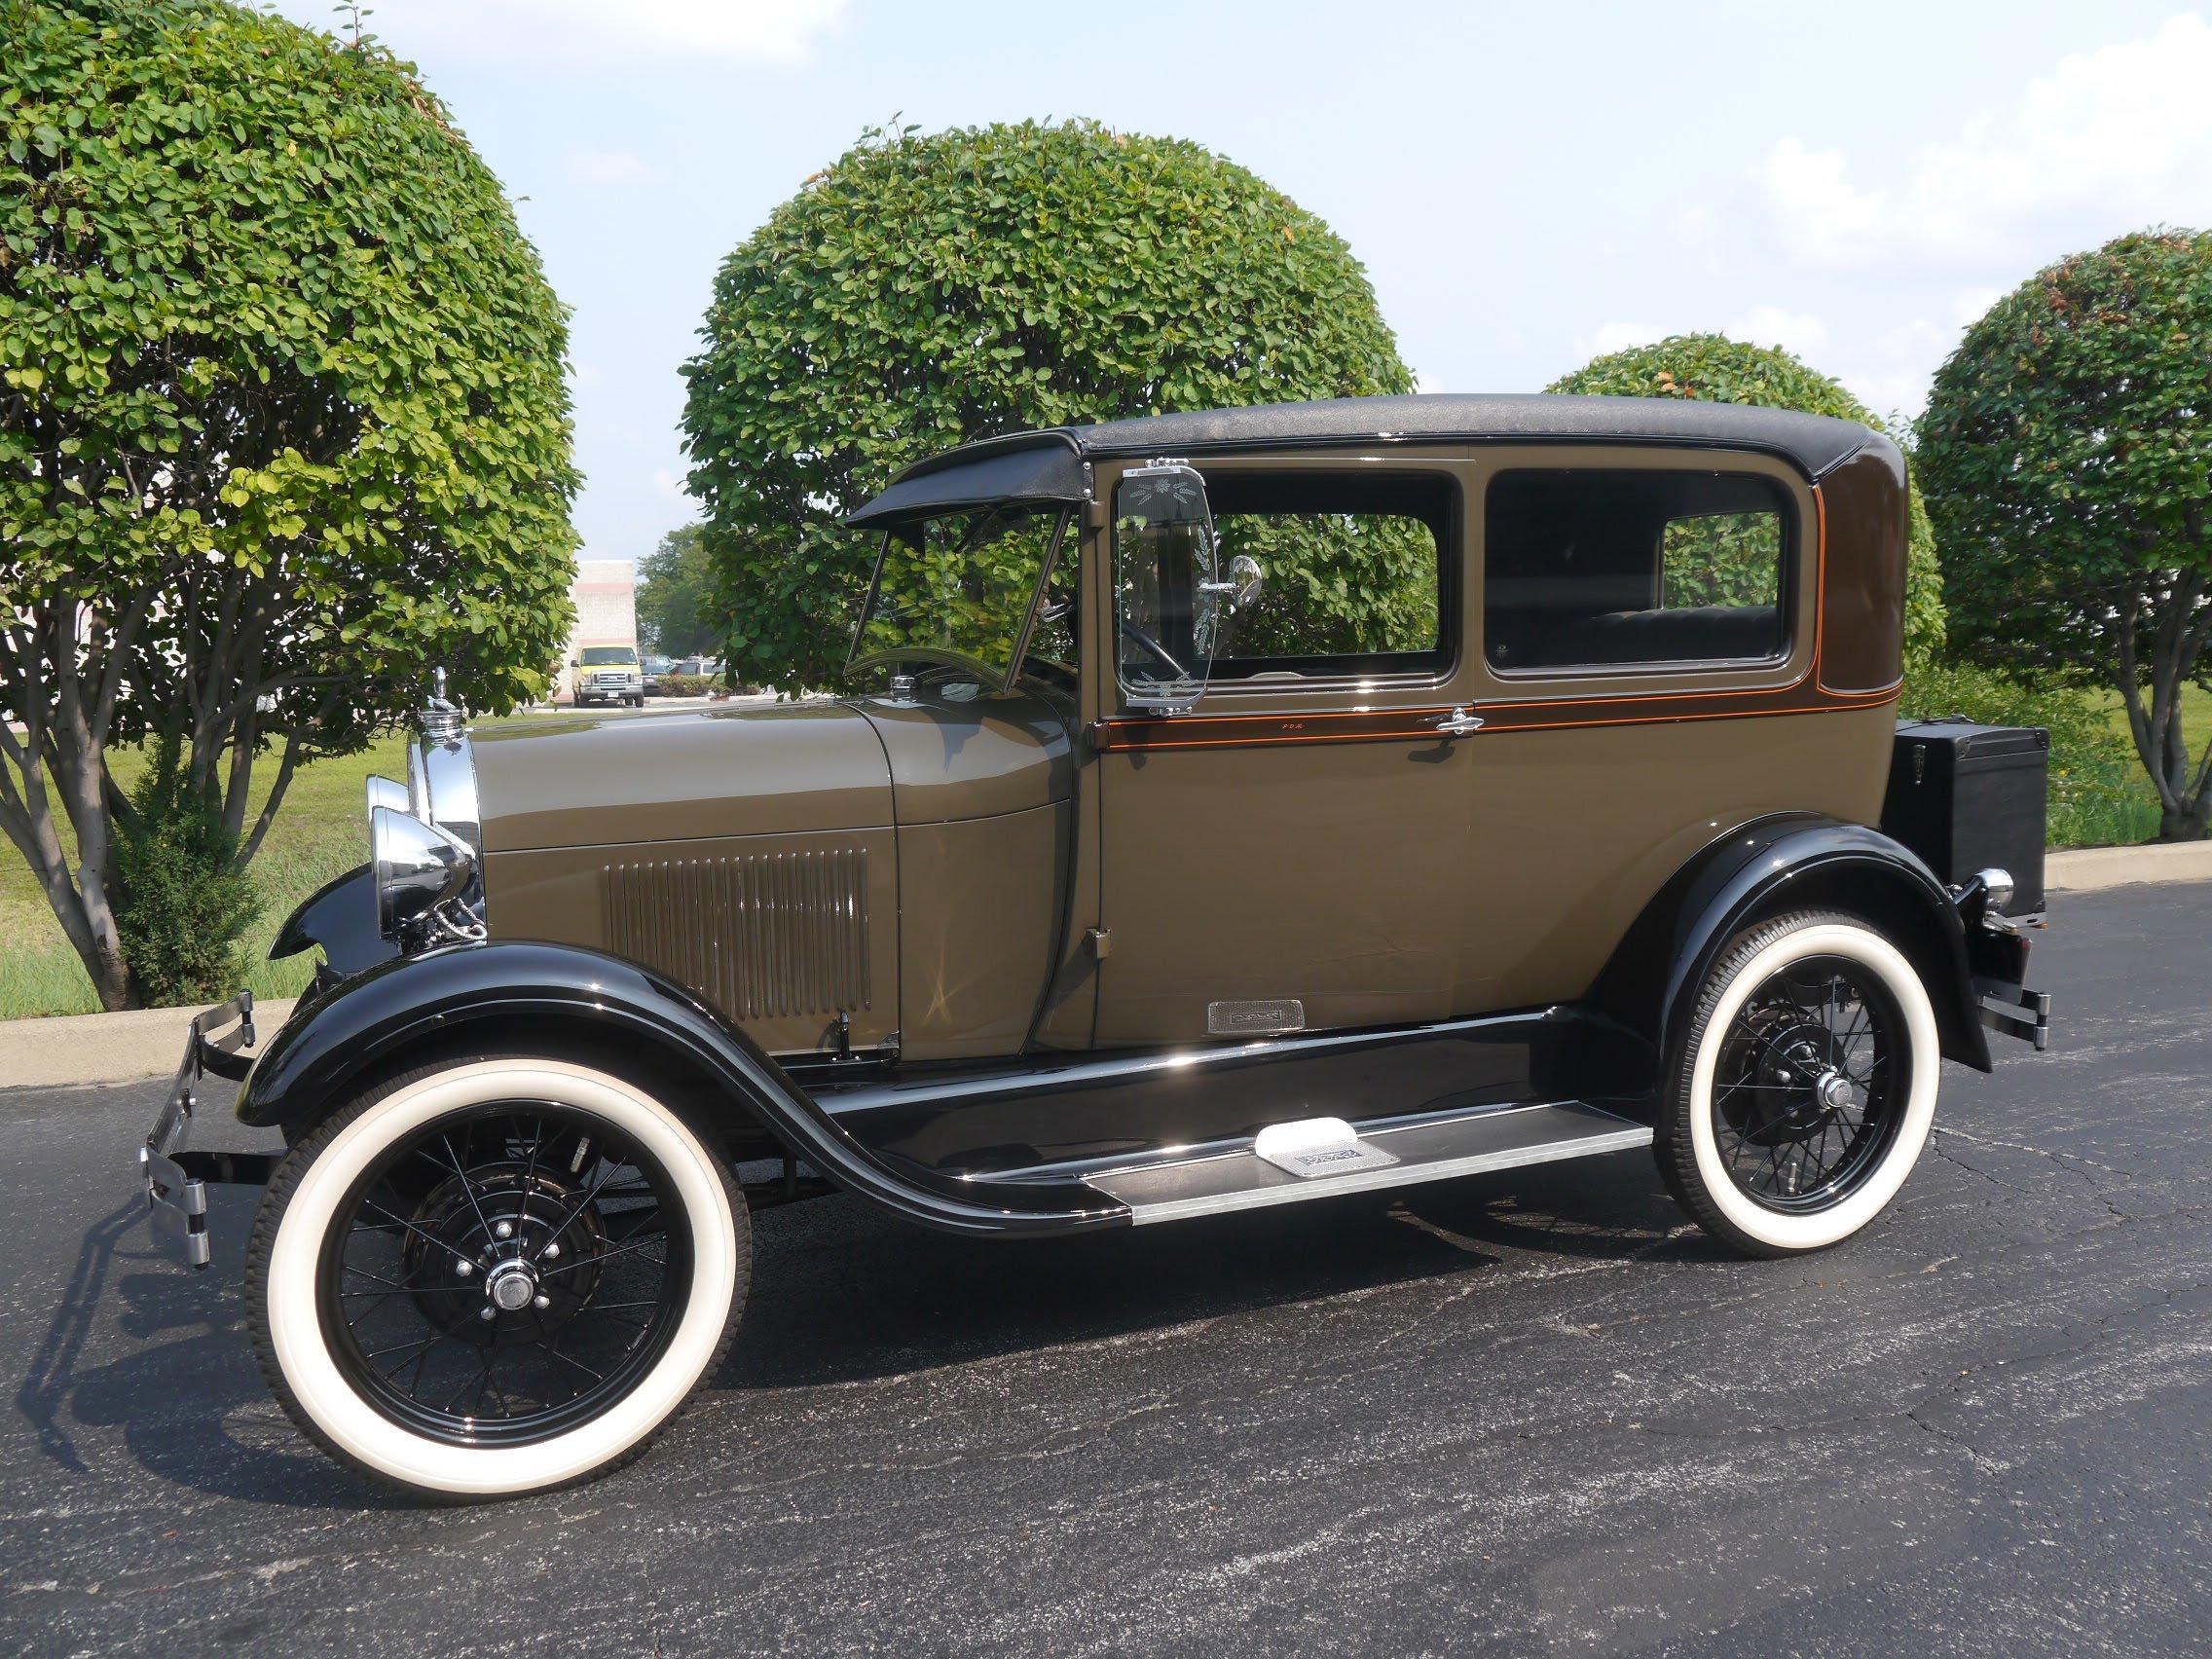 1929 Ford Model A HD wallpapers, Desktop wallpaper - most viewed